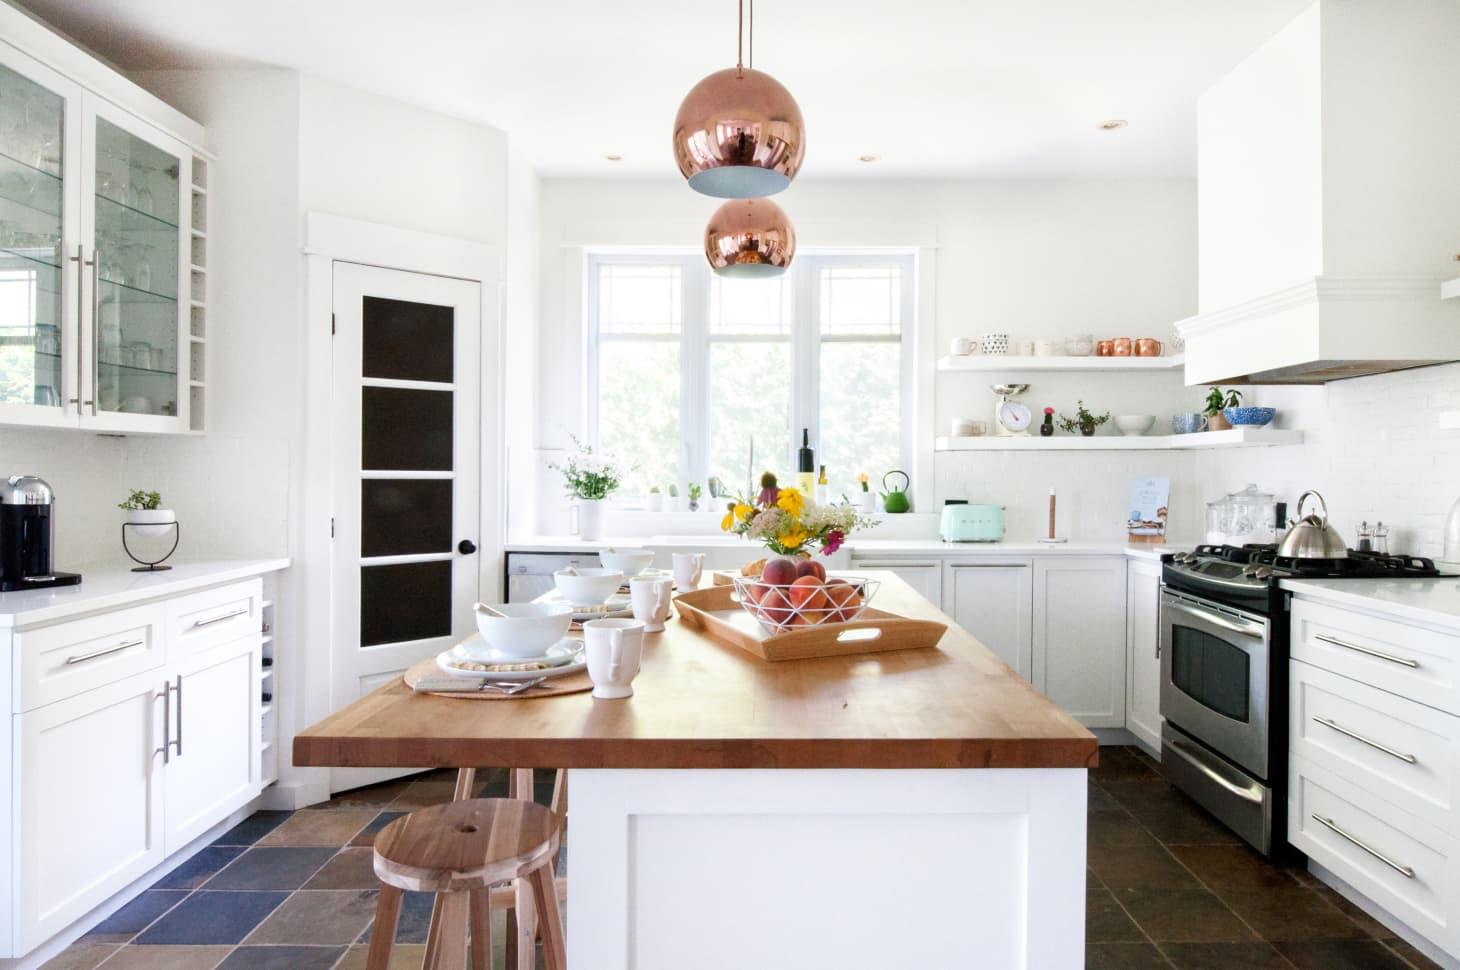 Sensational 25 Beautiful White Kitchen Ideas Design Decorating Tips Pabps2019 Chair Design Images Pabps2019Com